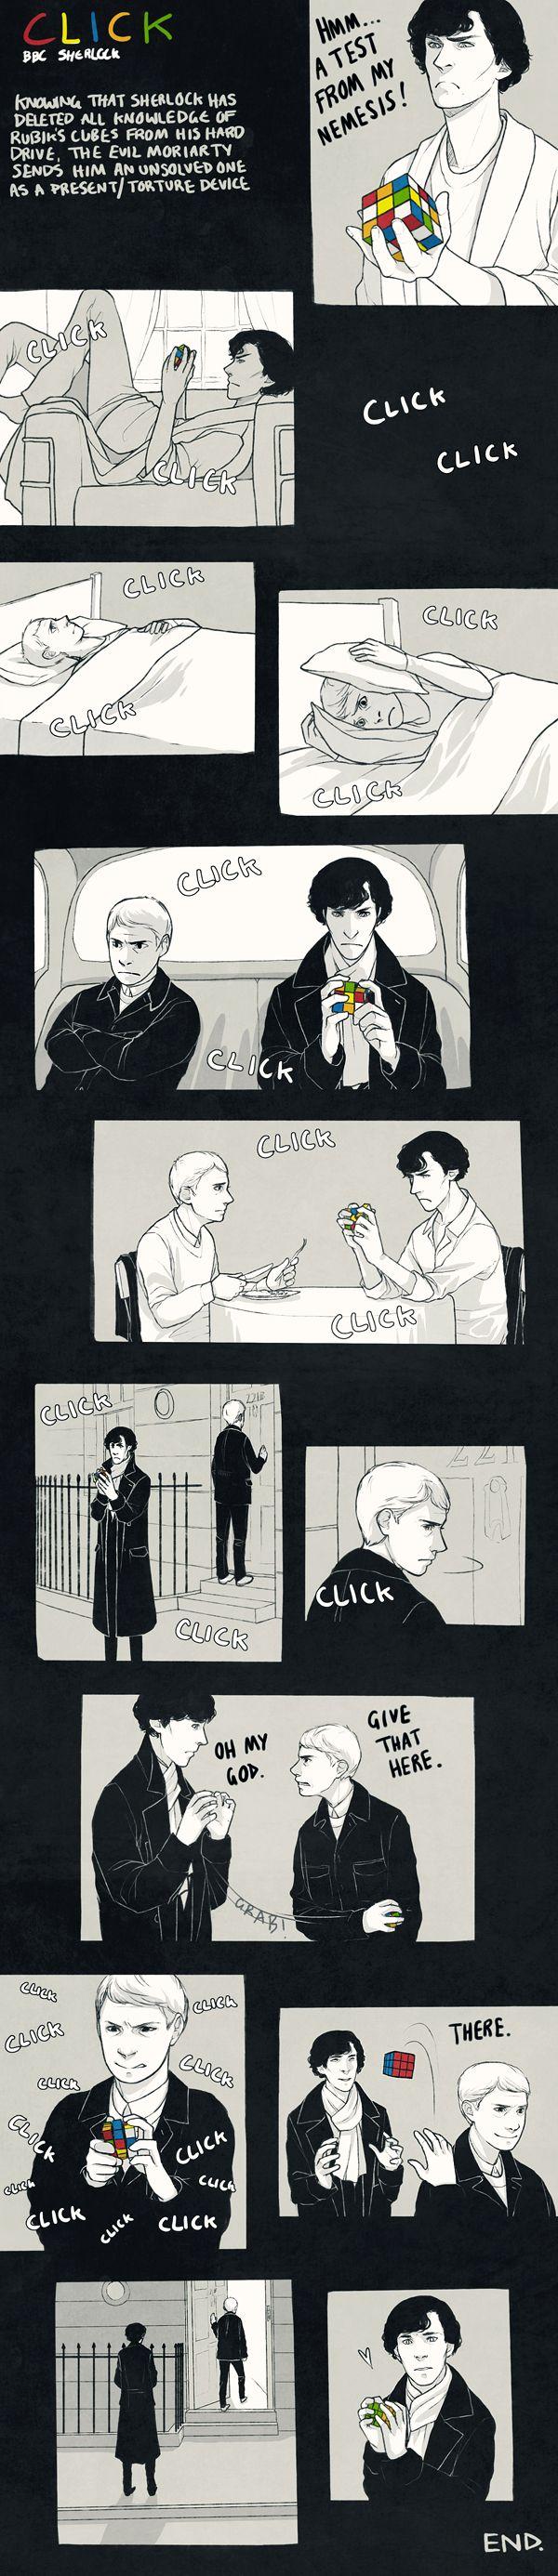 Dr. John Watson | page 4 of 15 - Zerochan Anime Image Board Mobile